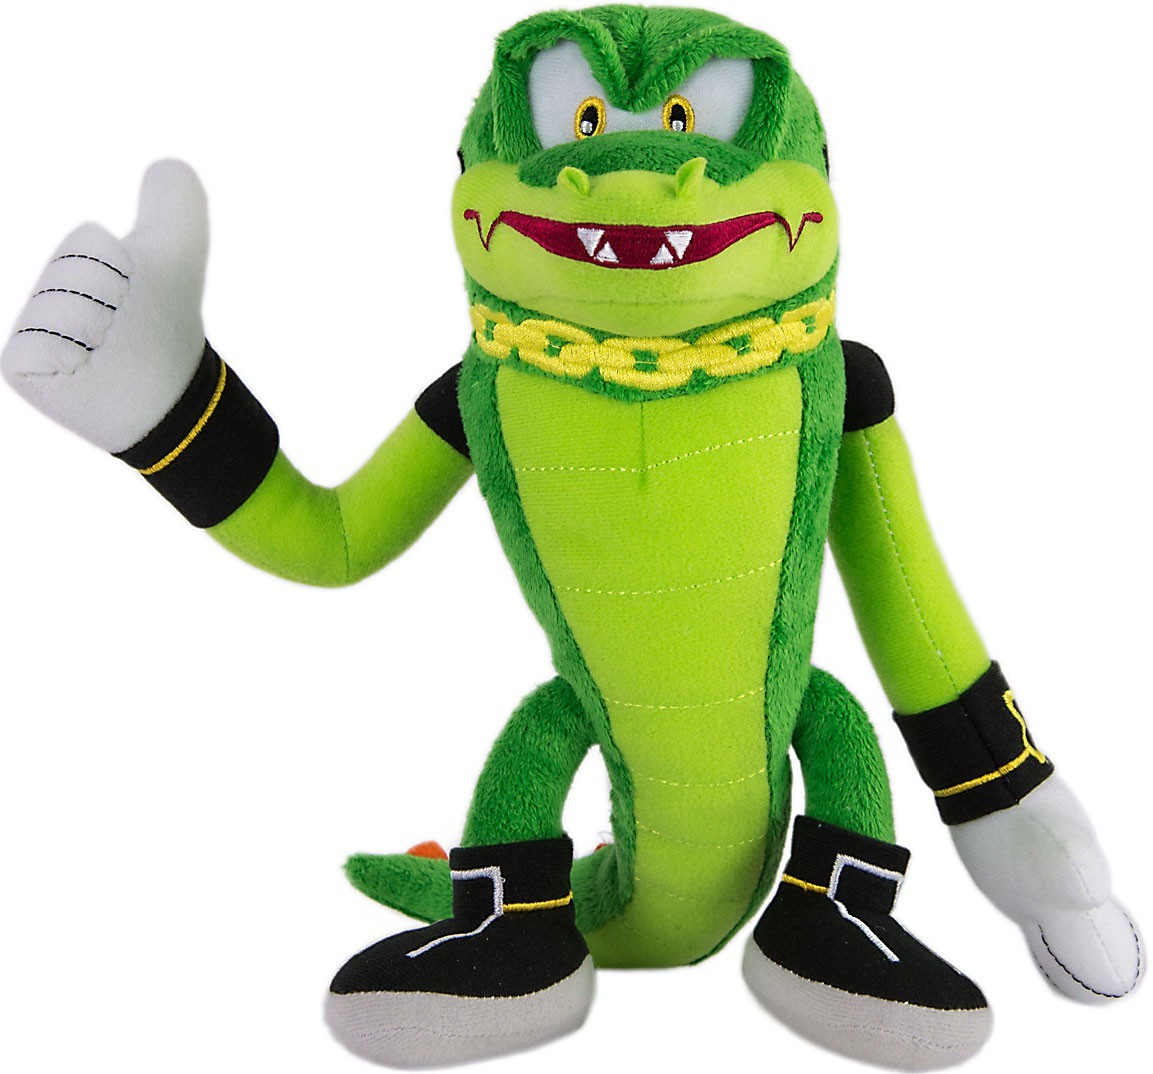 1153x1074 Tomy Sonic The Hedgehog Vector The Crocodile 8 Stuffed Plush